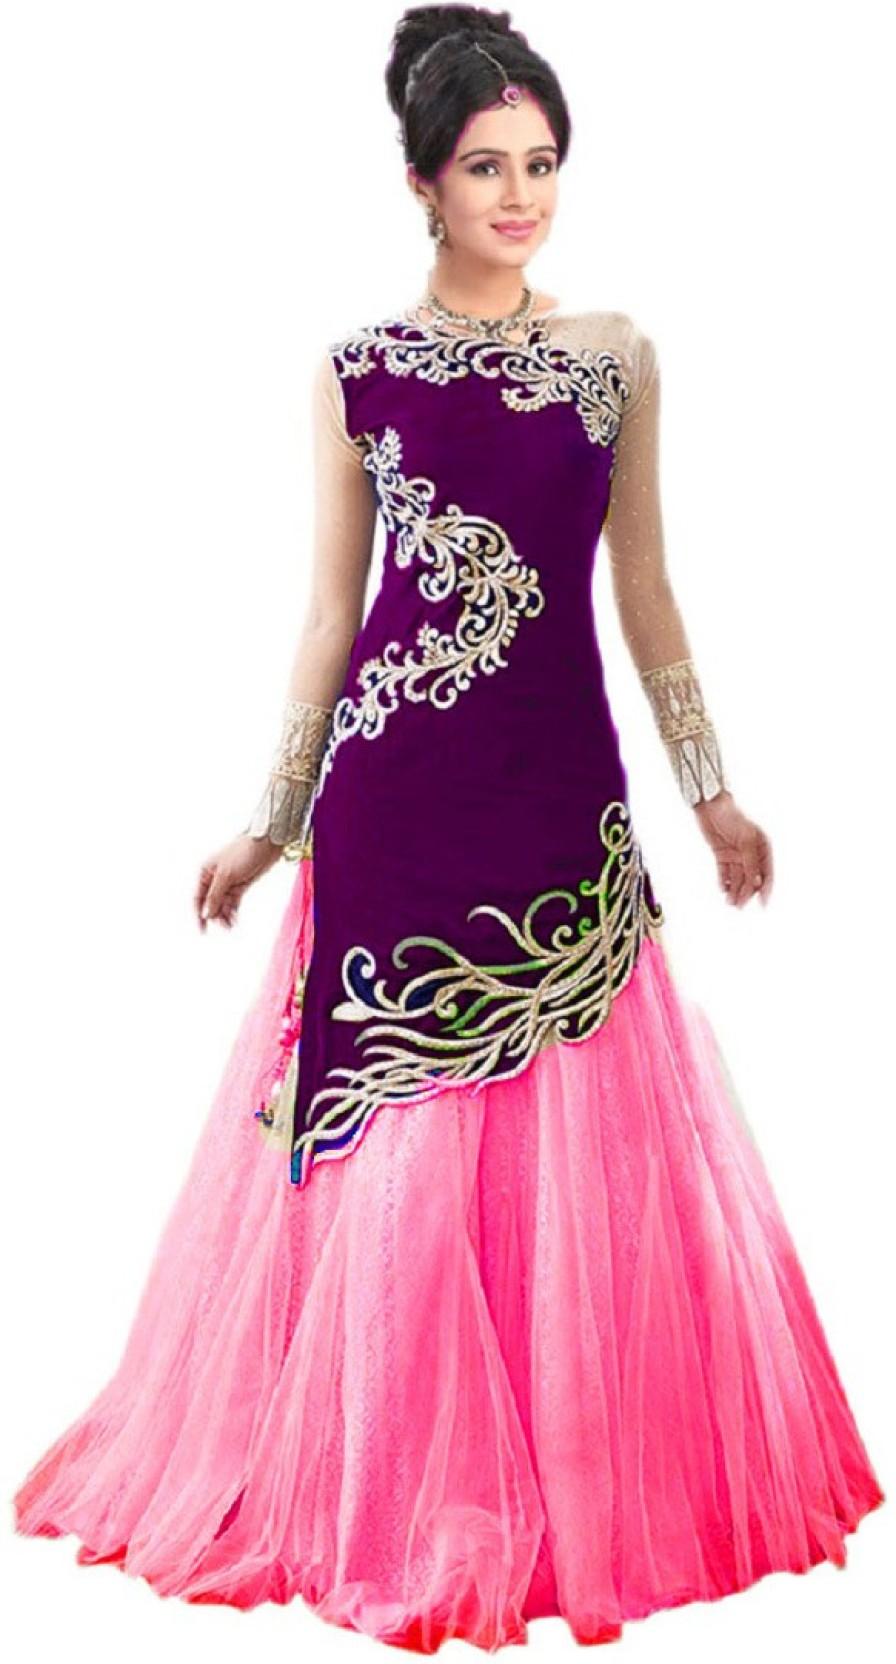 Savaliya Enterprise Embroidered Self Design Ghagra Choli Buy Fiction Peplum Dress Purple Add To Cart